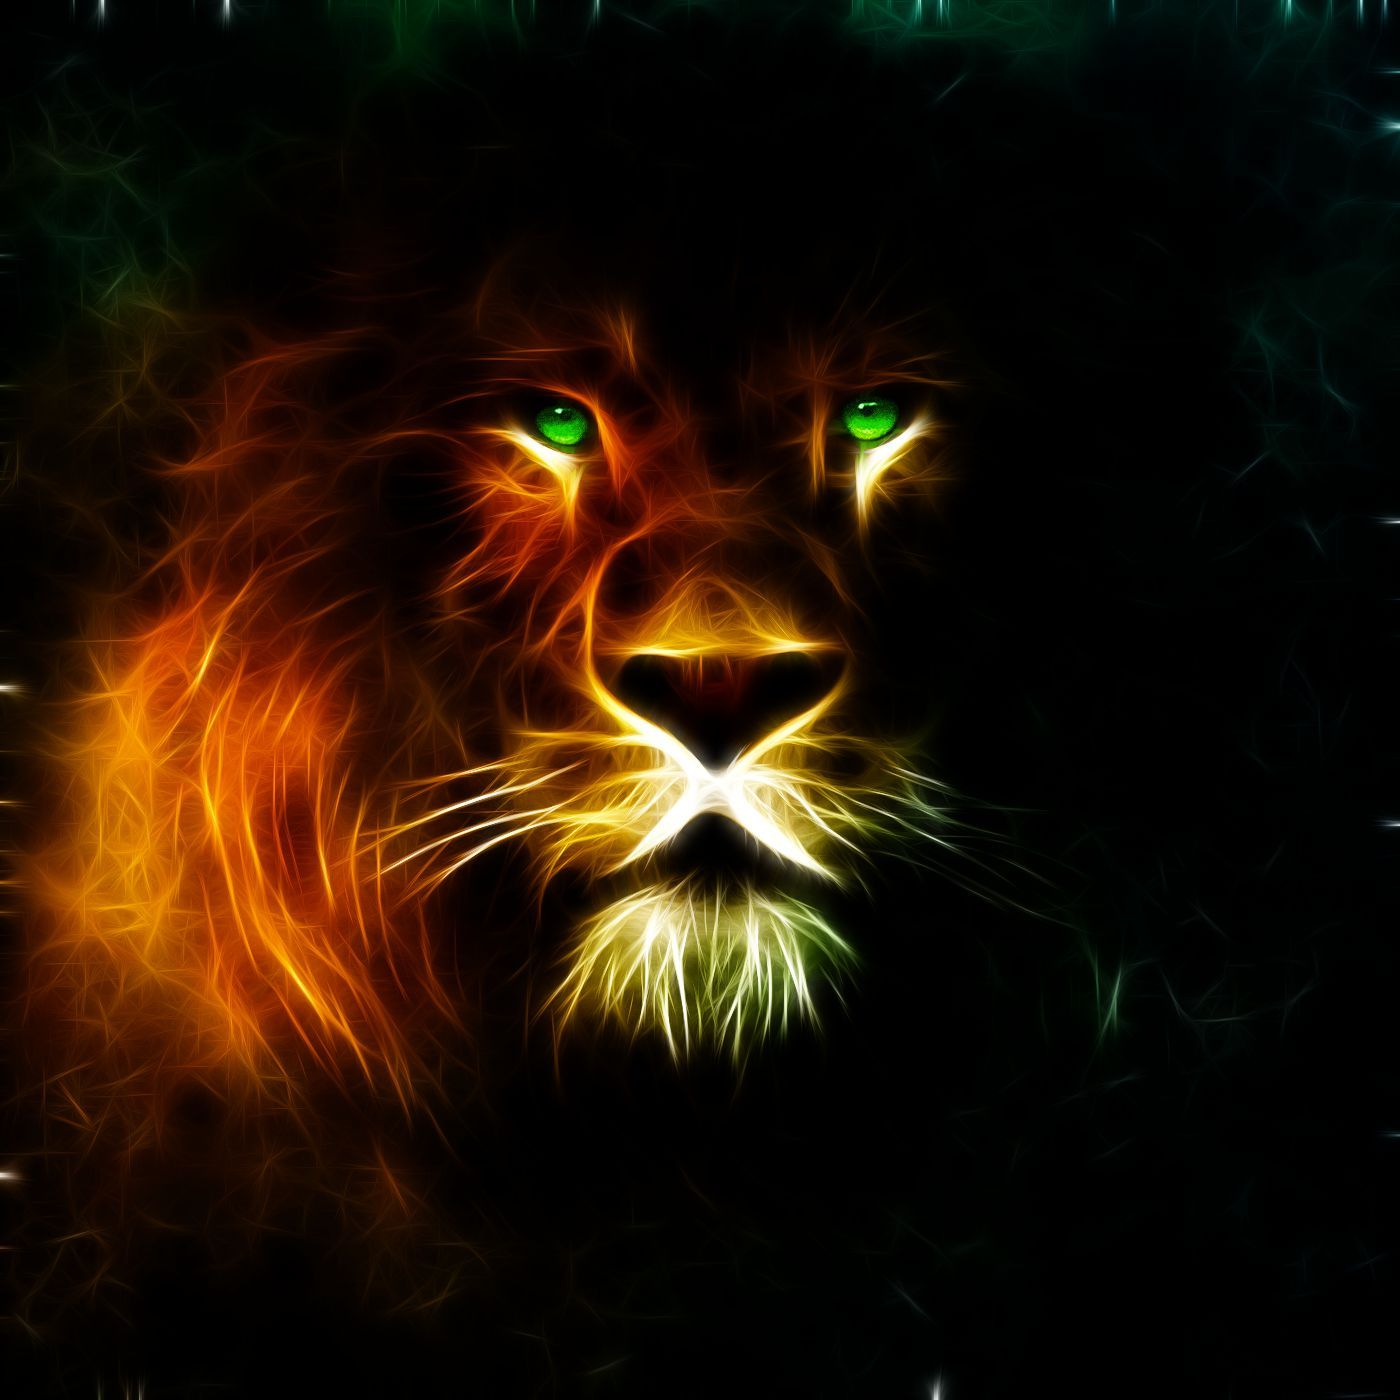 narnia lion art - id: 56394 | decor! | pinterest | narnia lion, lion